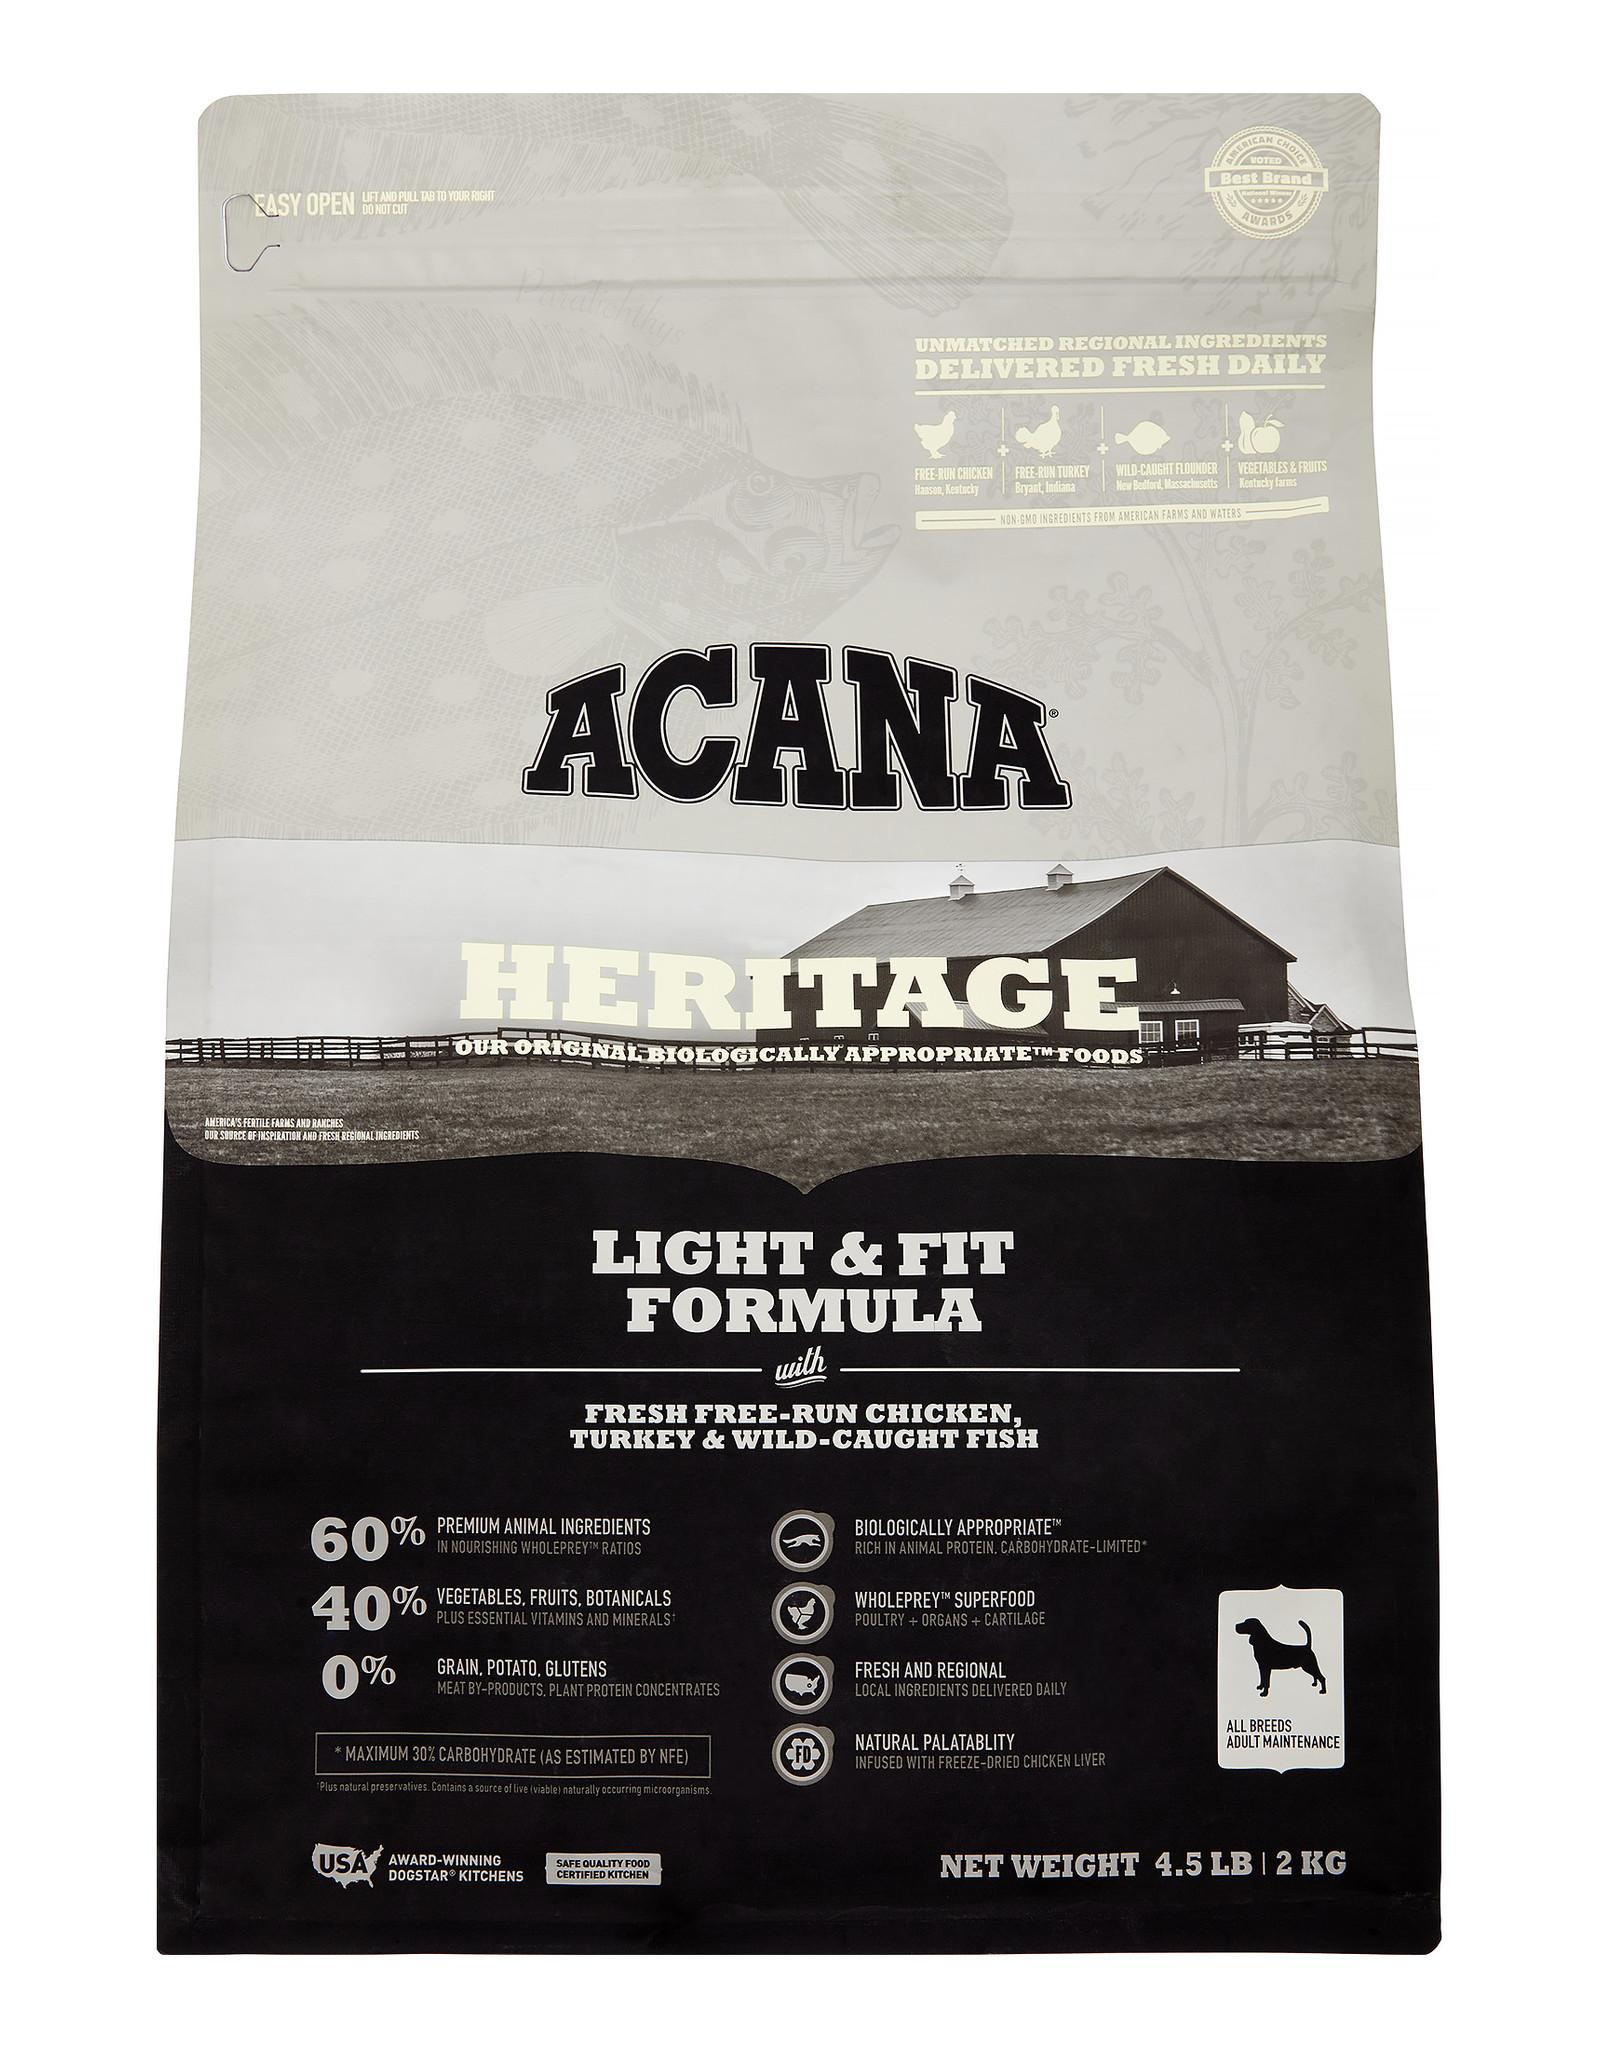 Acana Heritage Light & Fit 4.5lbs